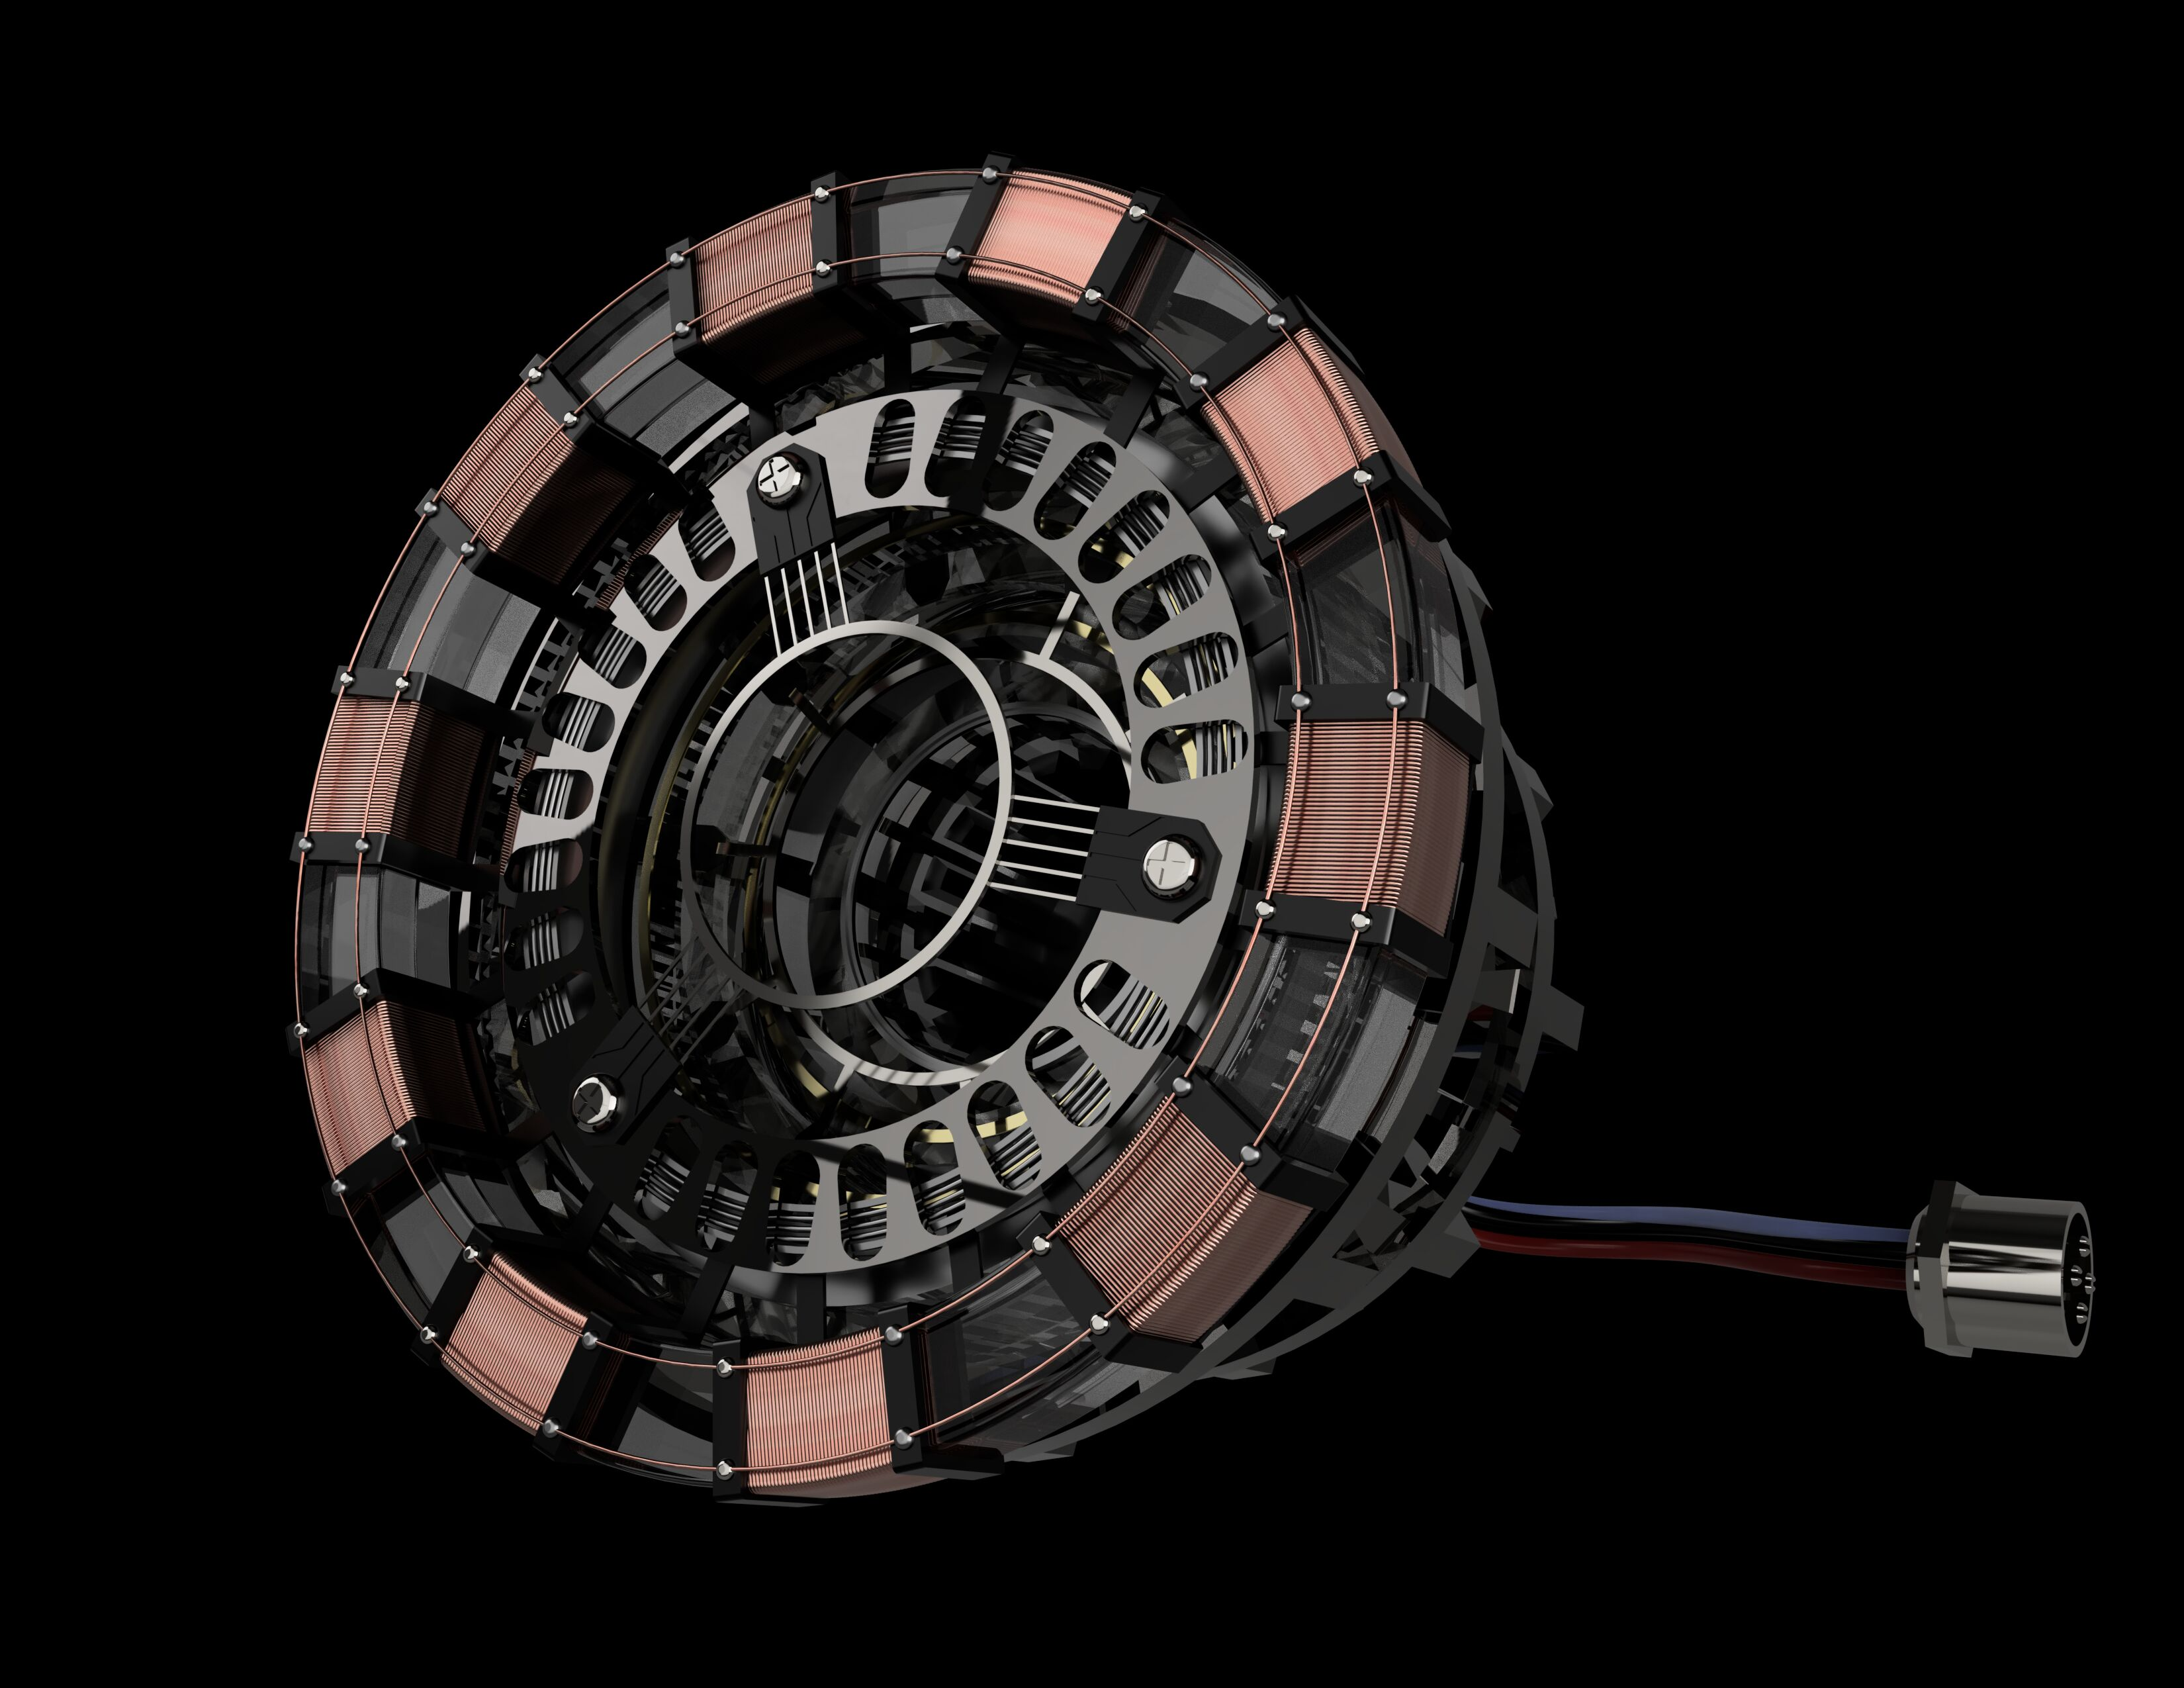 Z-tony-stark-2020-jul-18-03-41-00am-000-customizedview29459797161-png-3500-3500